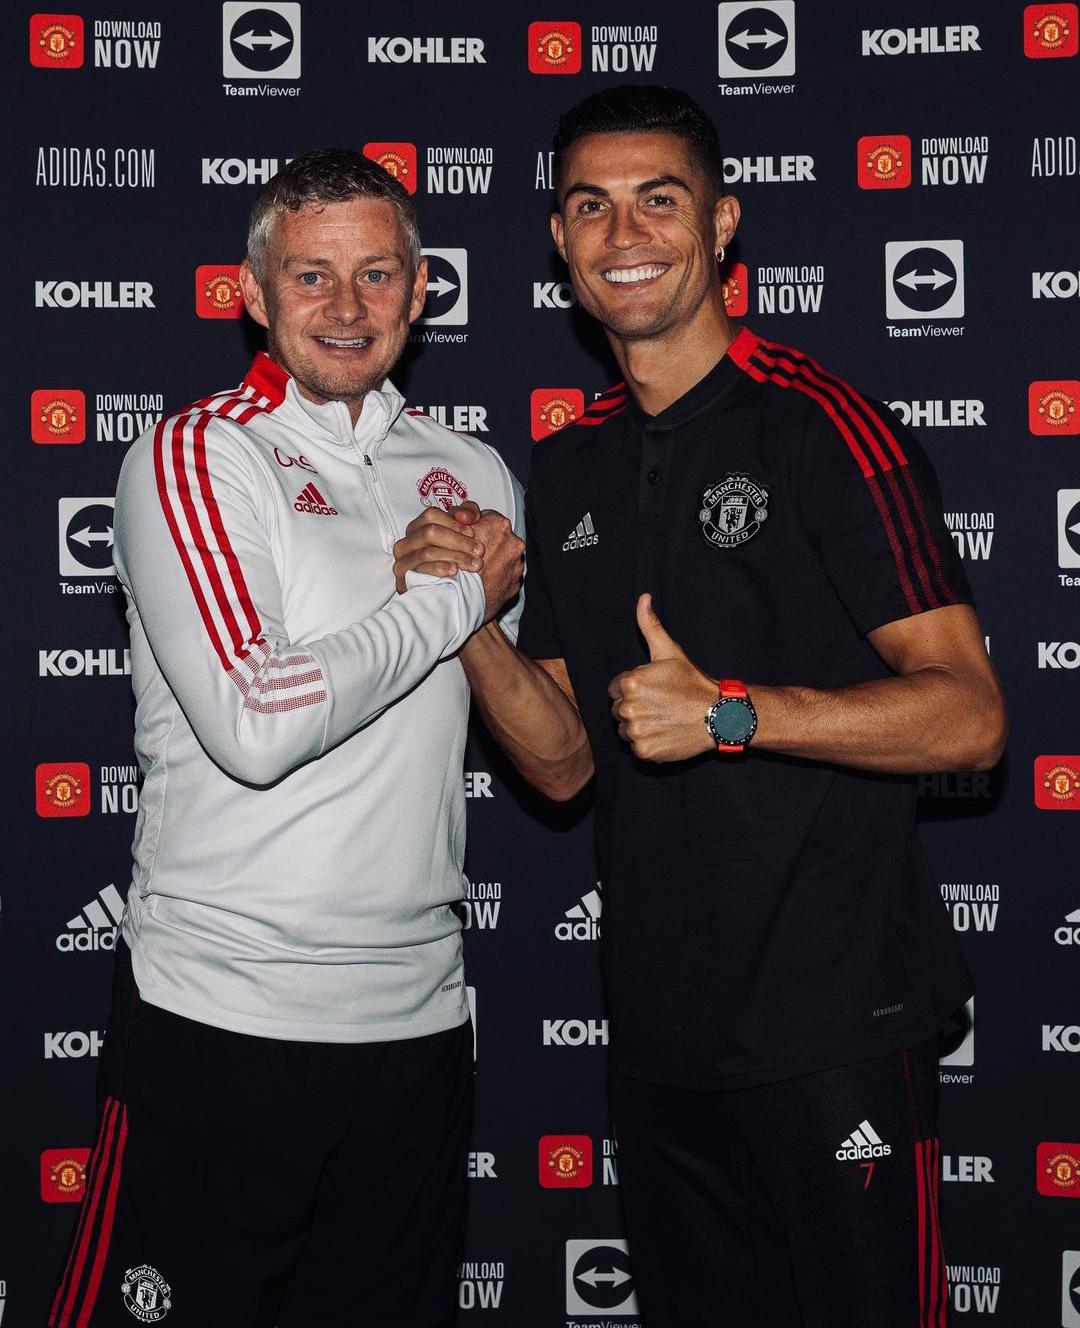 Manchester United release official photos of Cristiano Ronaldo